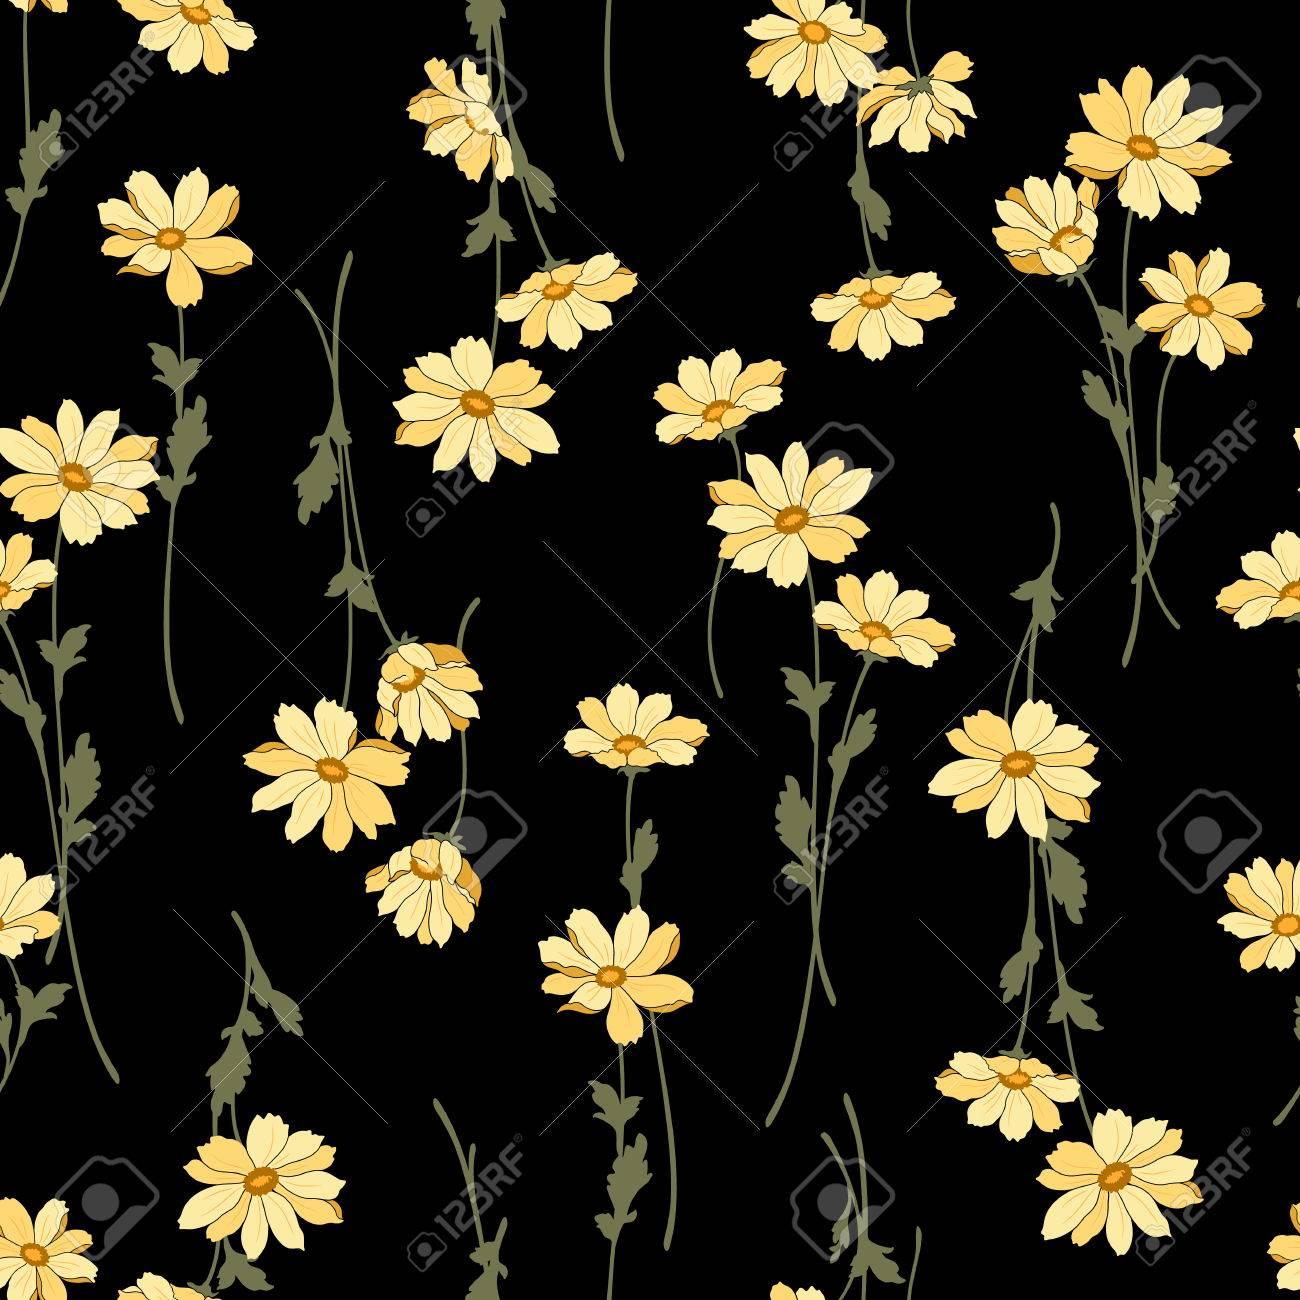 Flower illustration pattern - 51513048